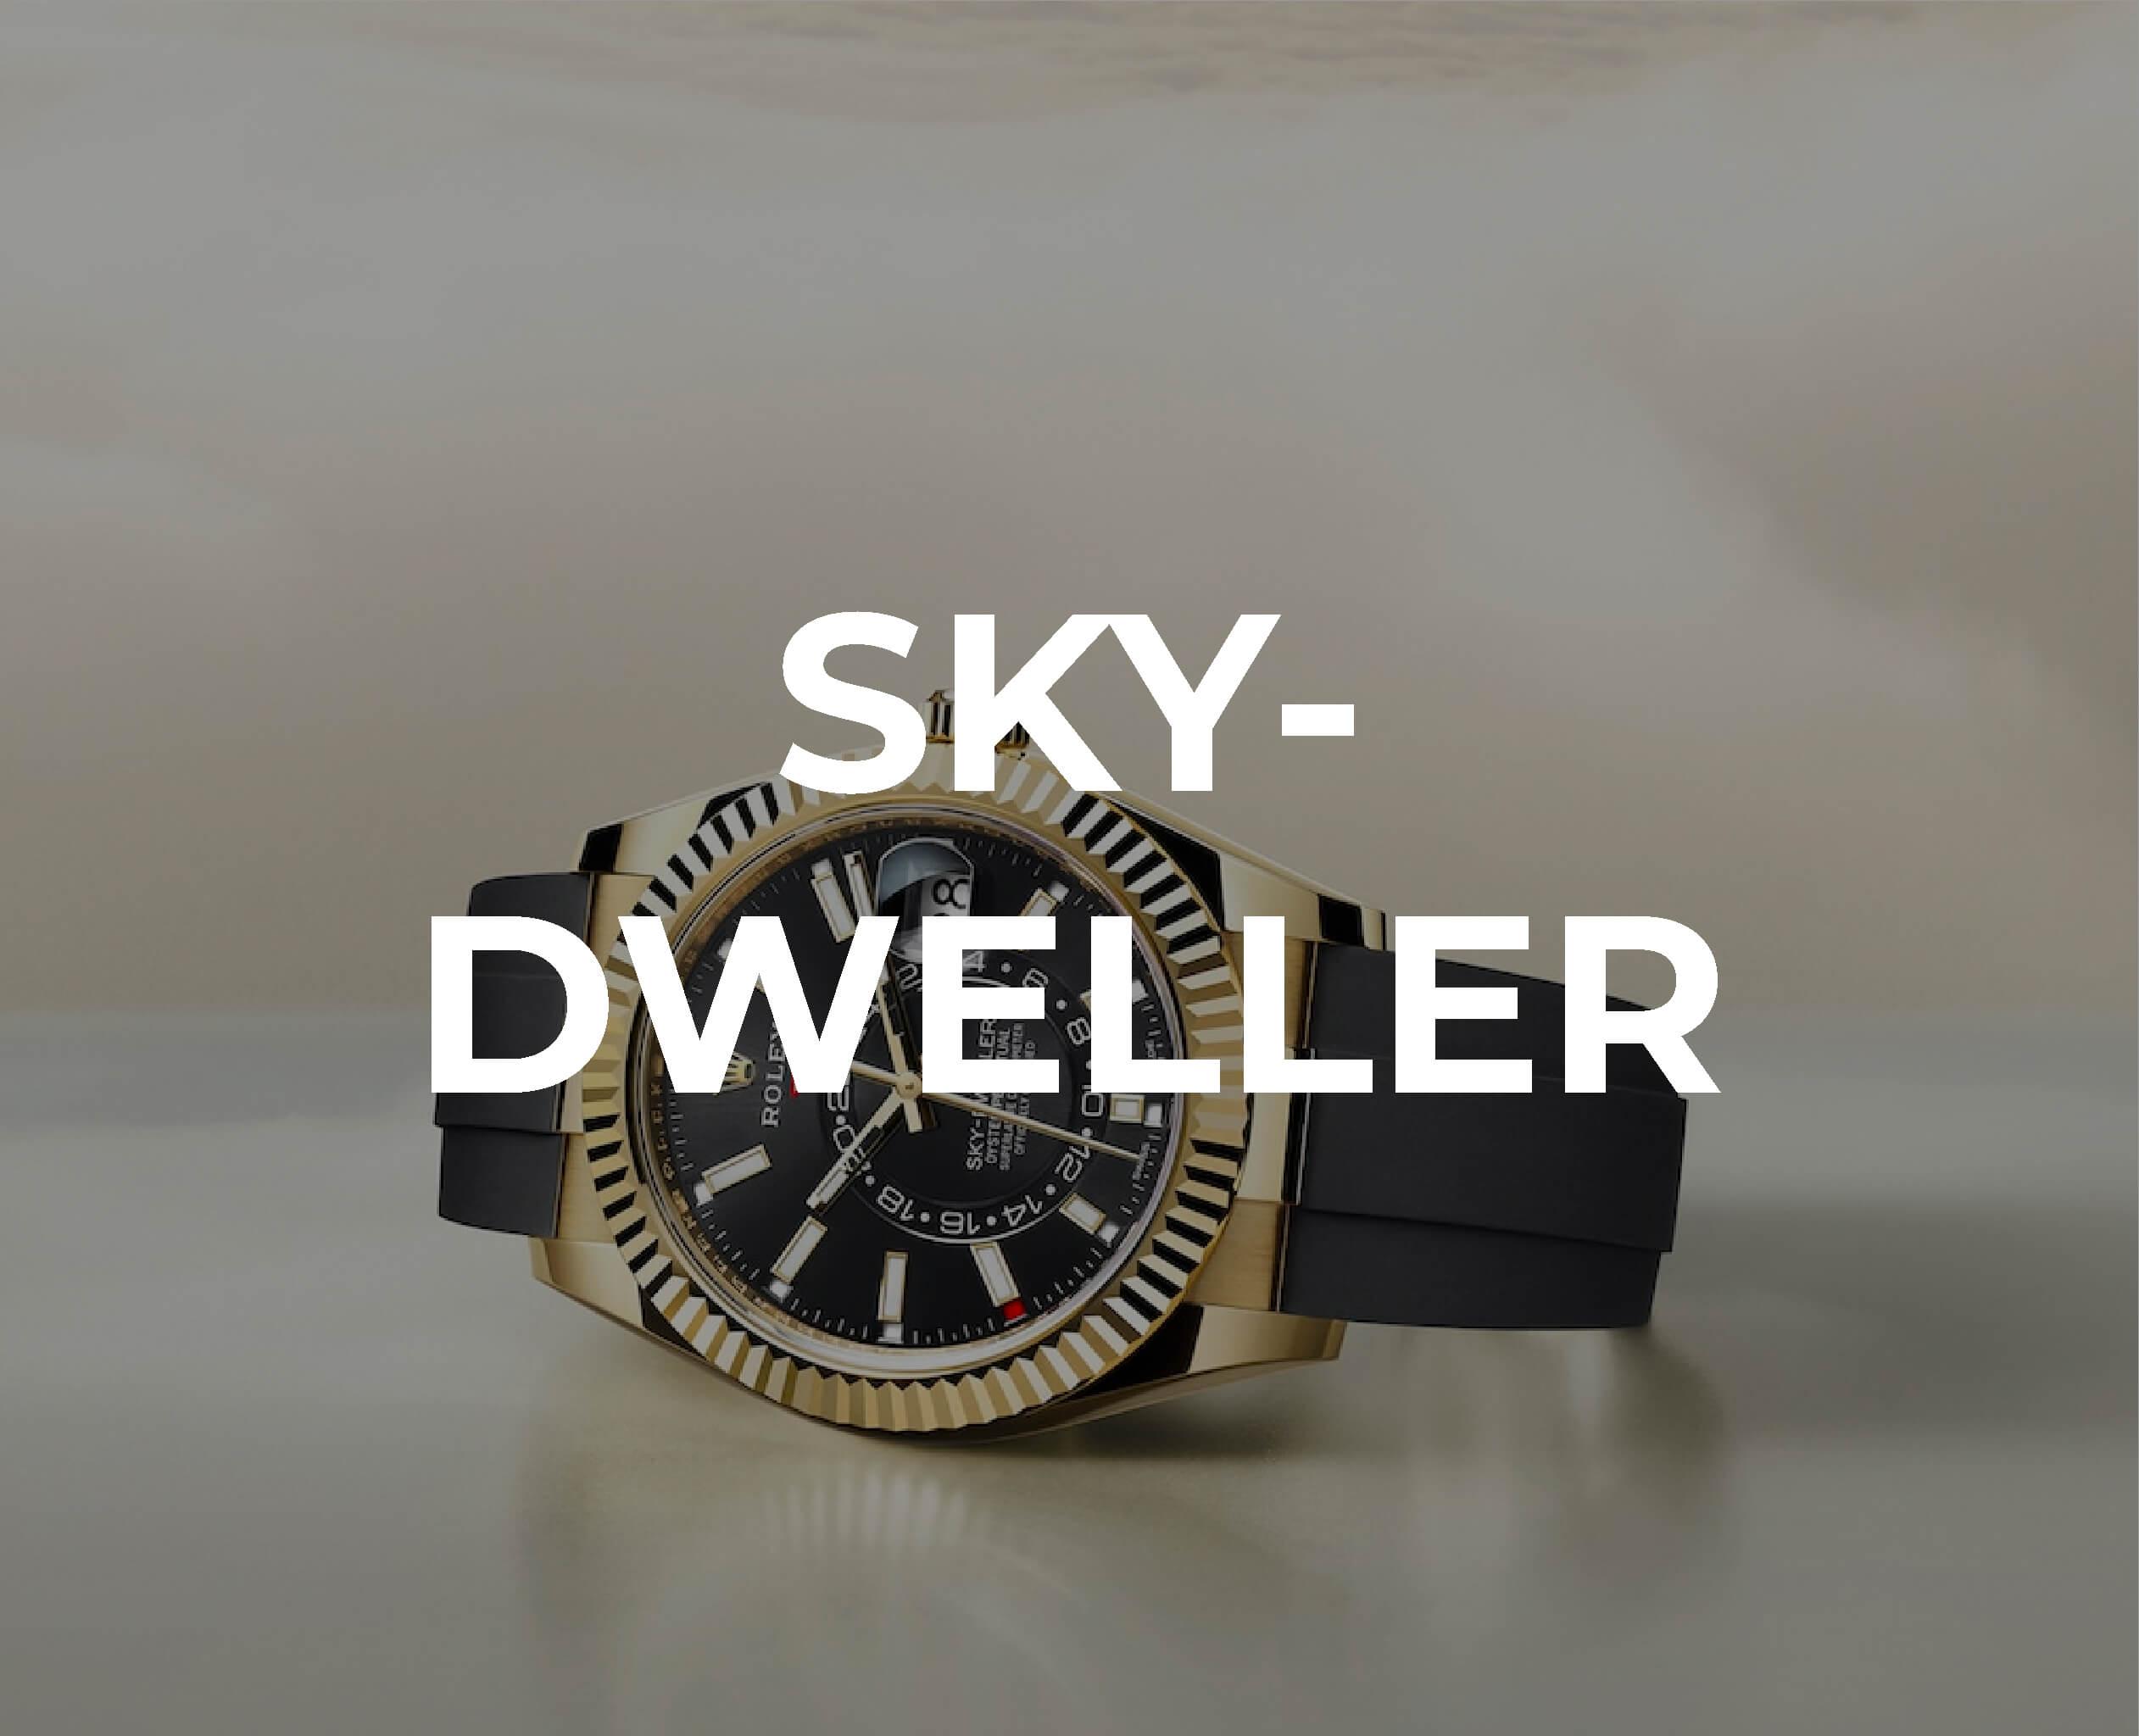 Rolex Sky-Dweller Collection